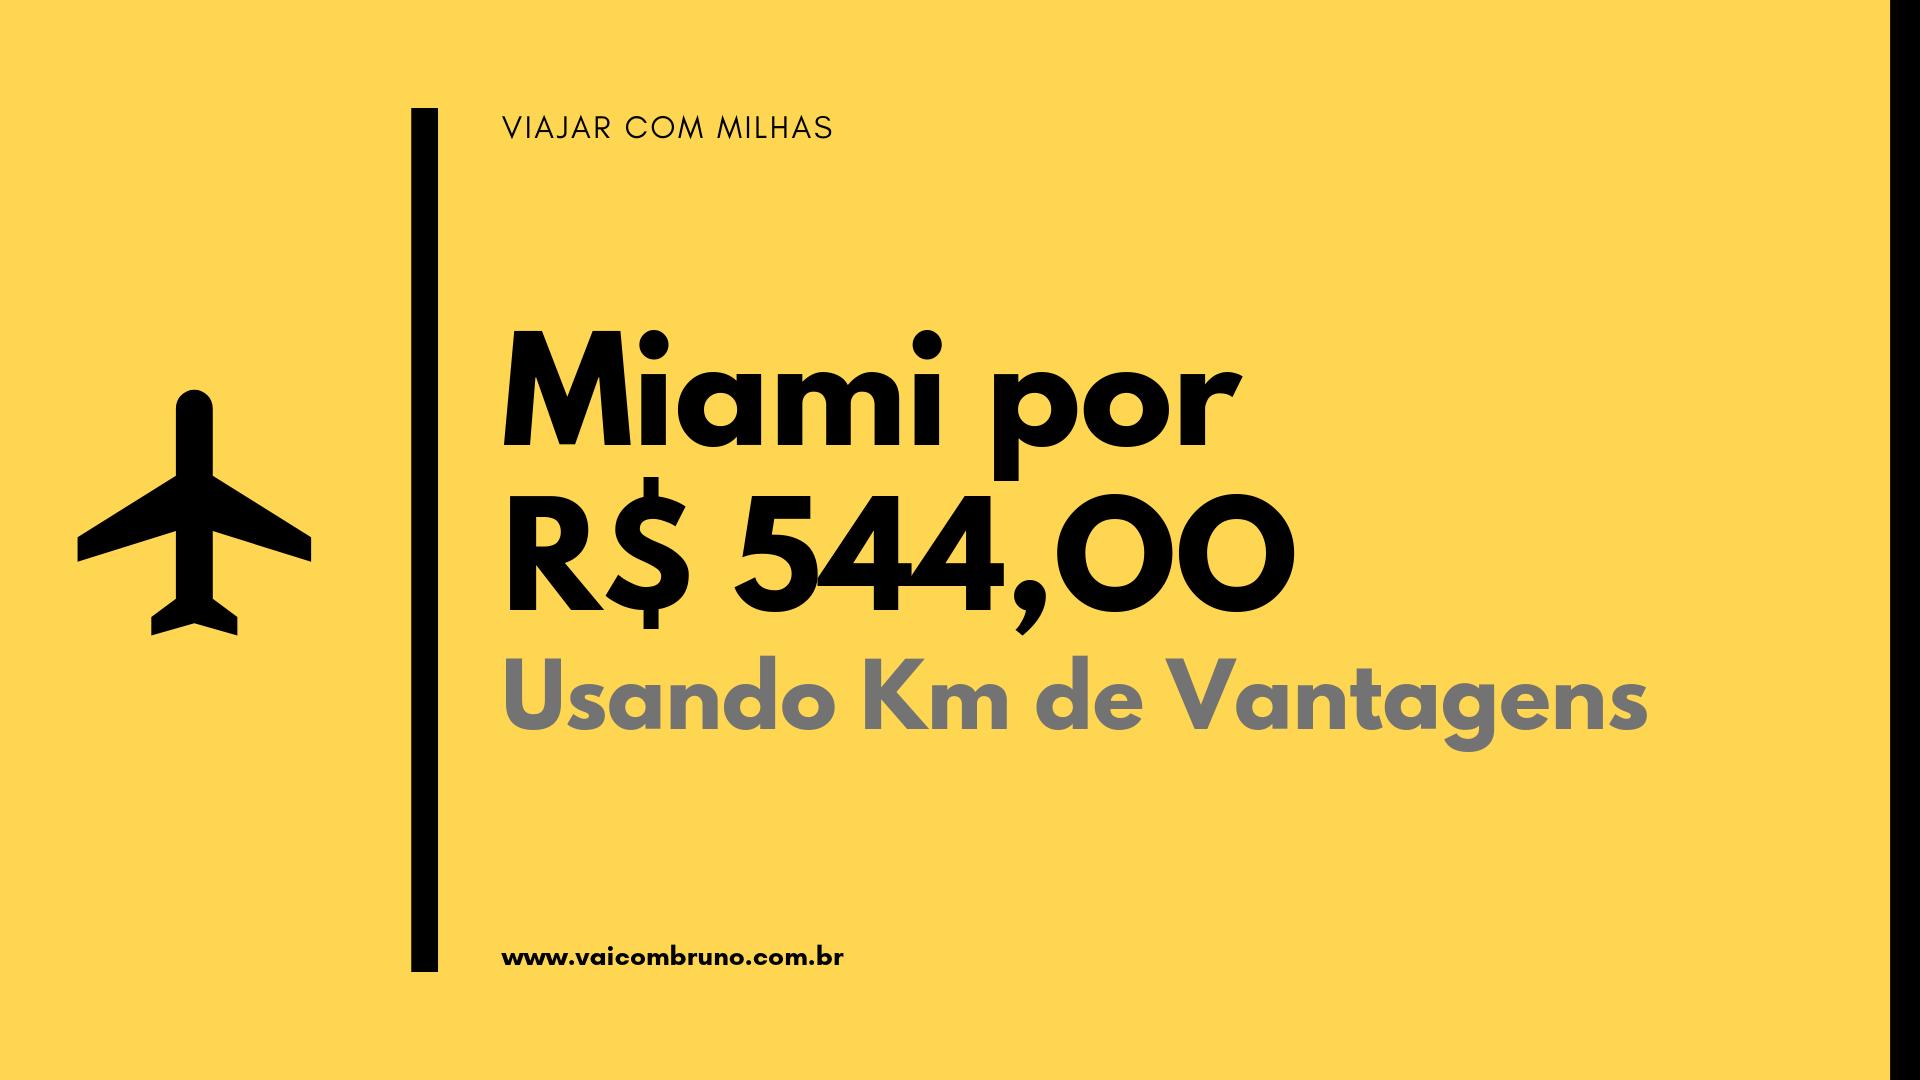 Cópia de Social Media Strategy - Miami por R$ 544,00 usando Km de Vantagens